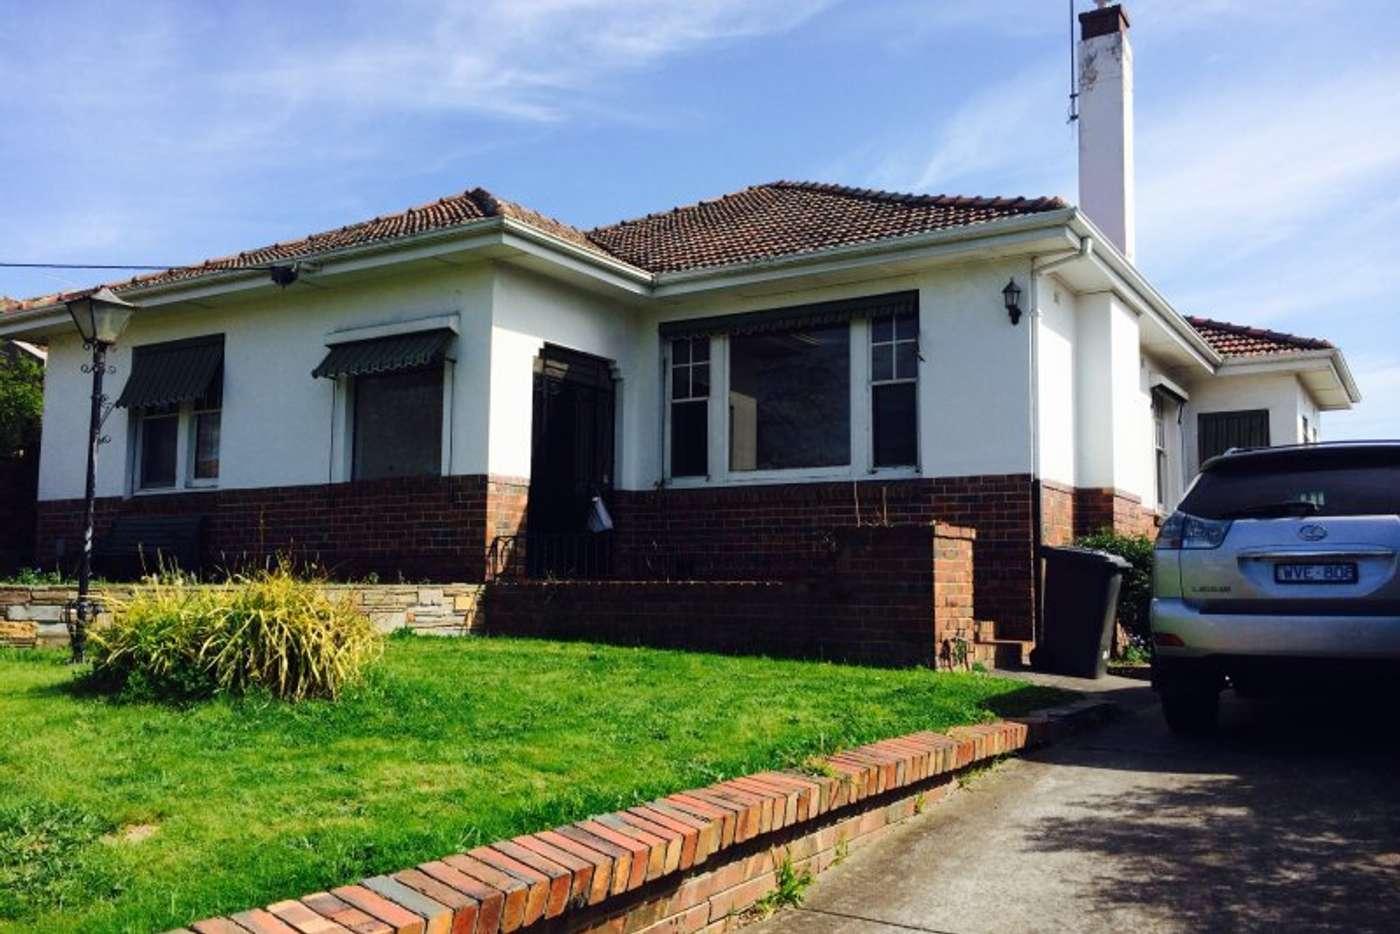 Main view of Homely house listing, 1/130 Glen Iris Road, Glen Iris VIC 3146